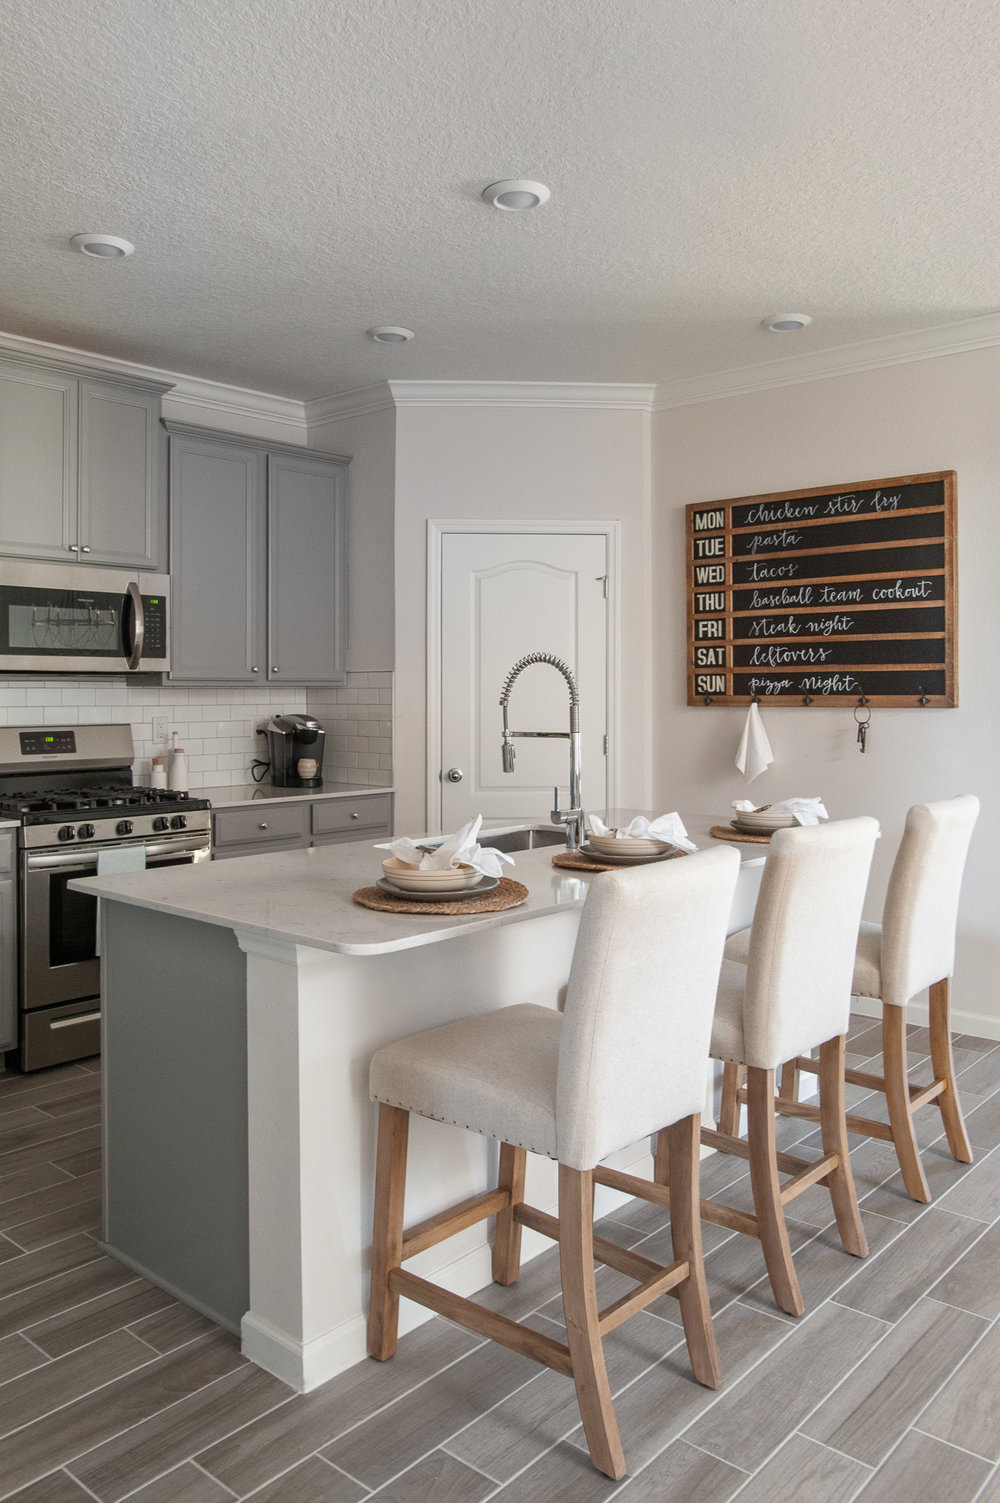 Micamy_Interior Designer_Design_Interior_Model_Merchandising_Kitchen_Grey_Cabinets_Forty West_Lennar_Place Setting_SubwayTile_Farmhouse_Faucet.jpg